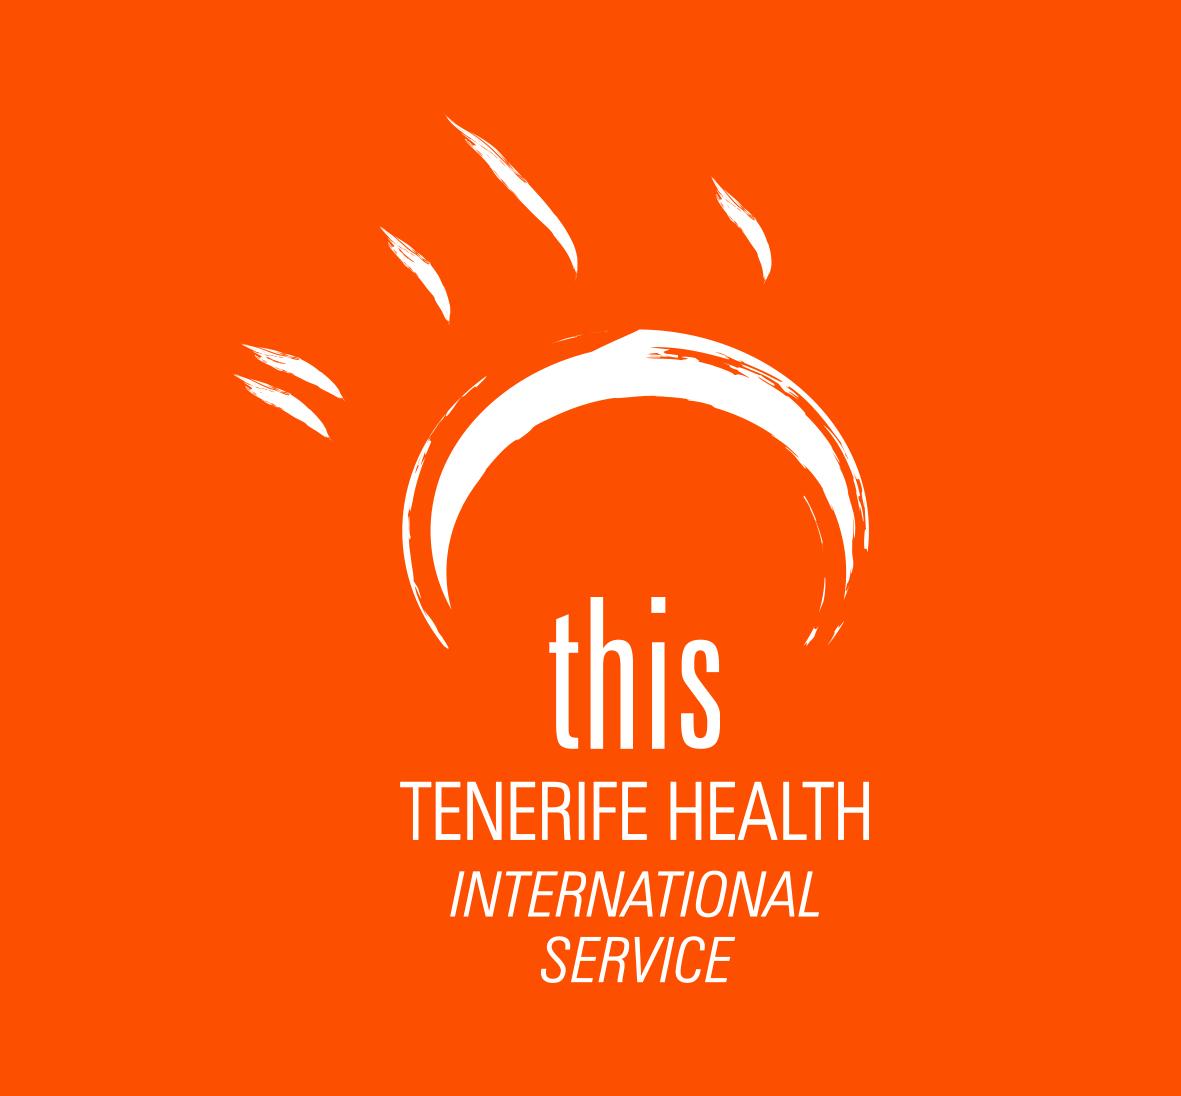 This, Tenerife Health International Services